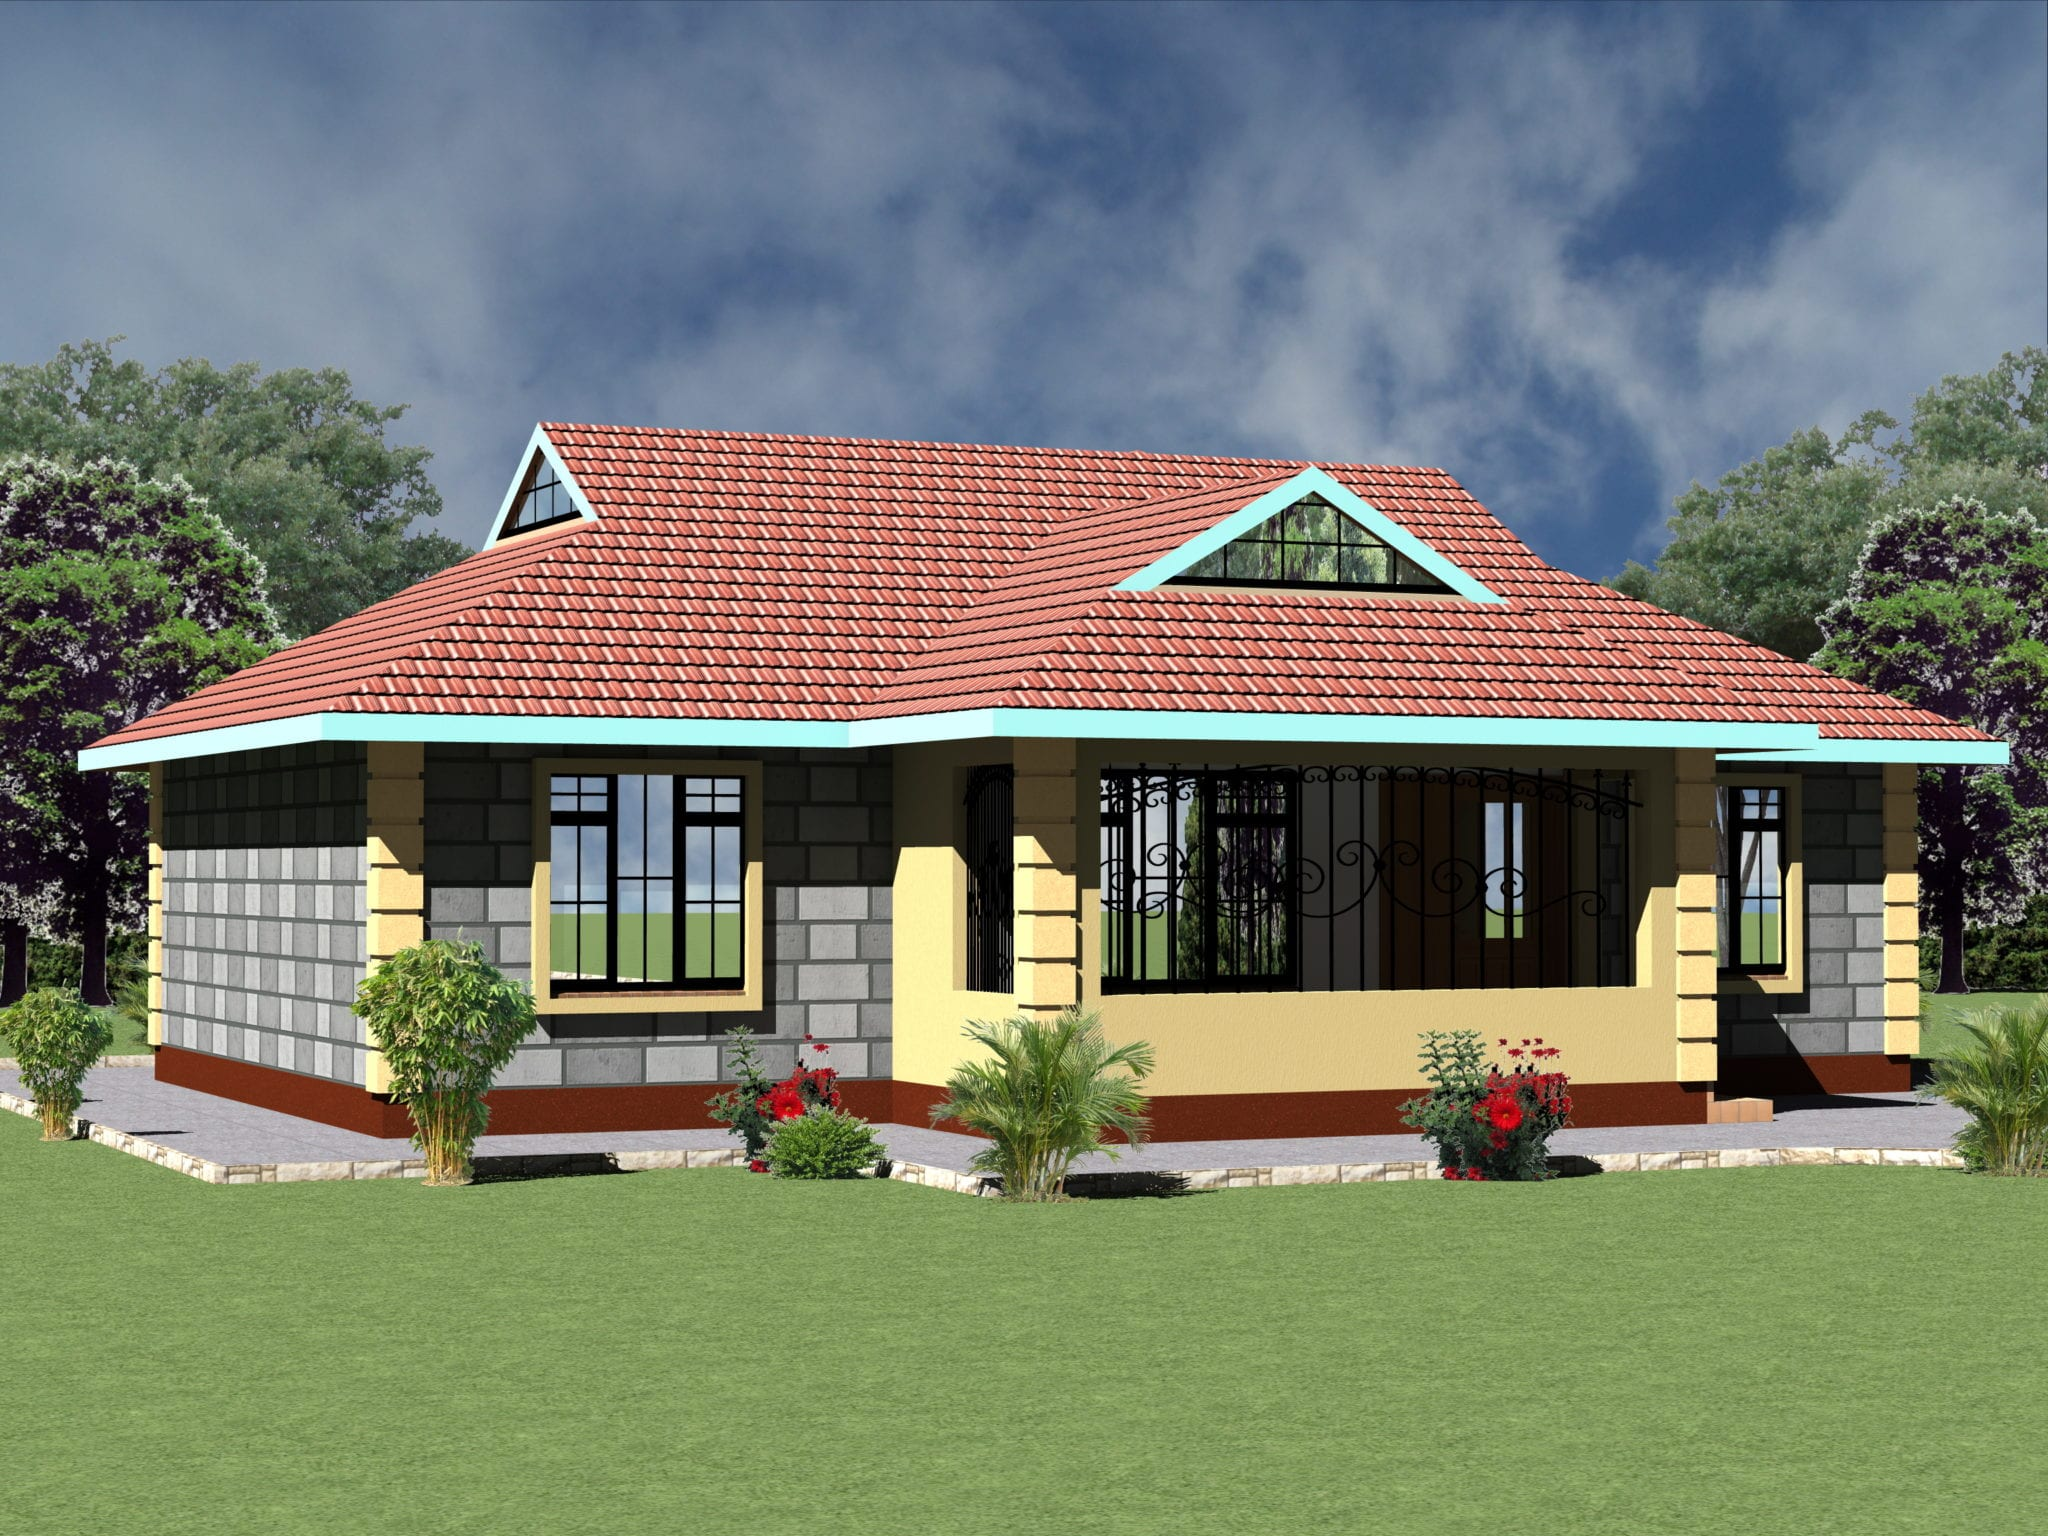 4 Bedroom House Plans And Designs Novocom Top